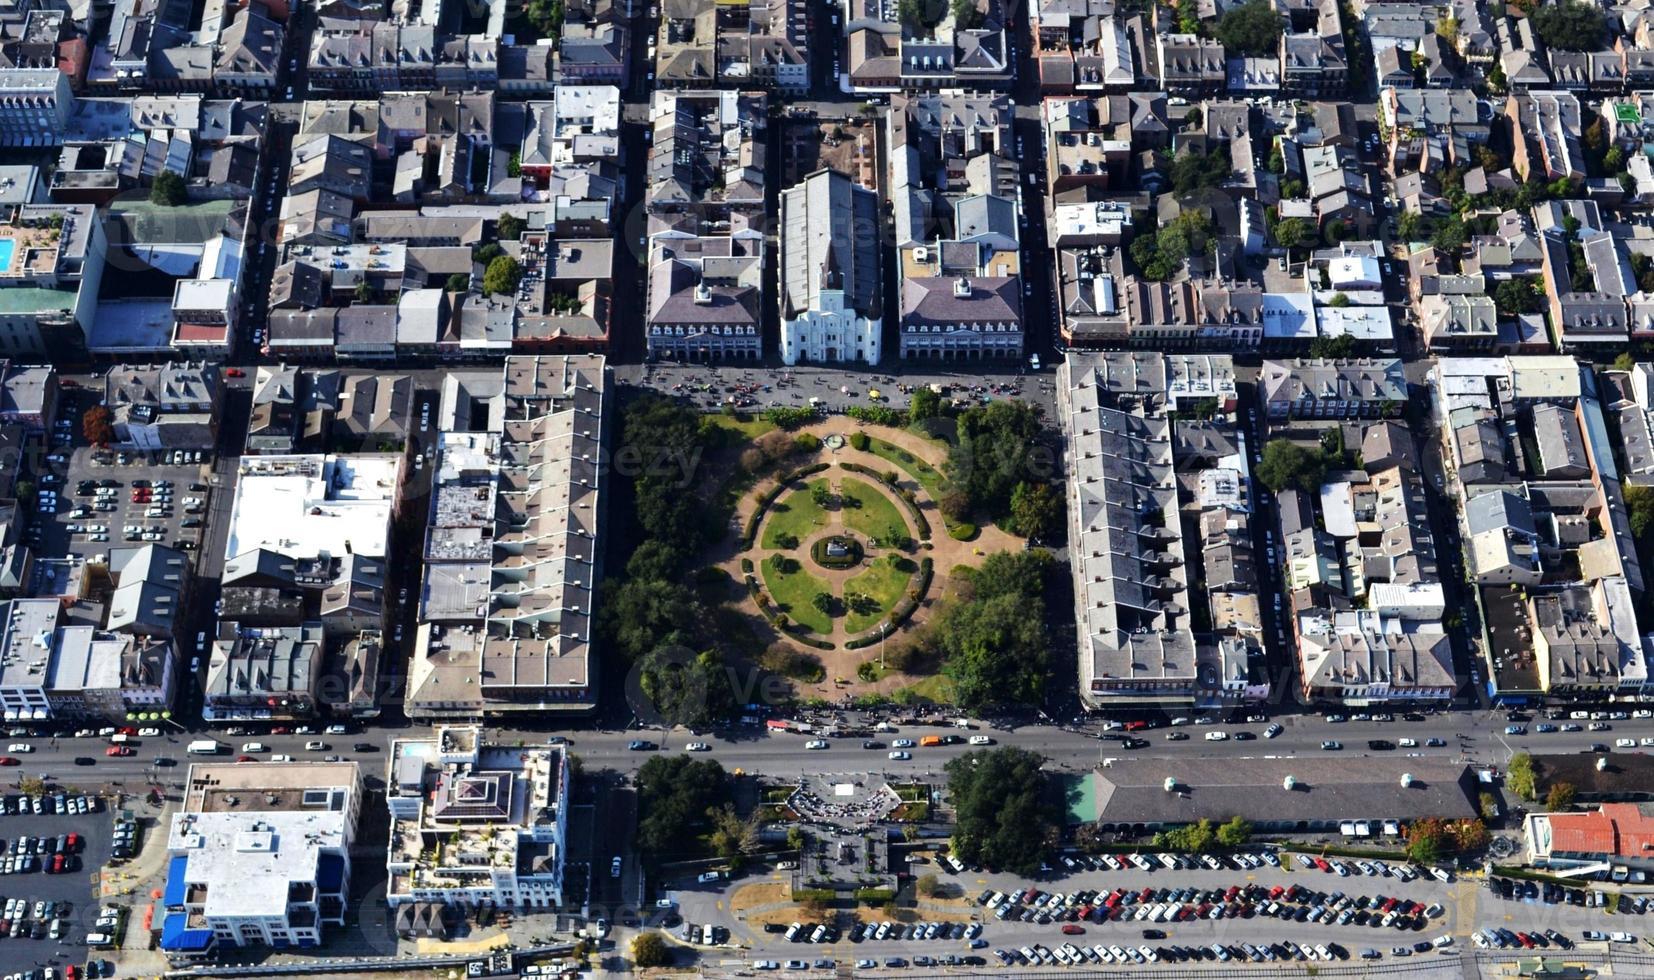 New Orleans French Quarter Jackson Square foto